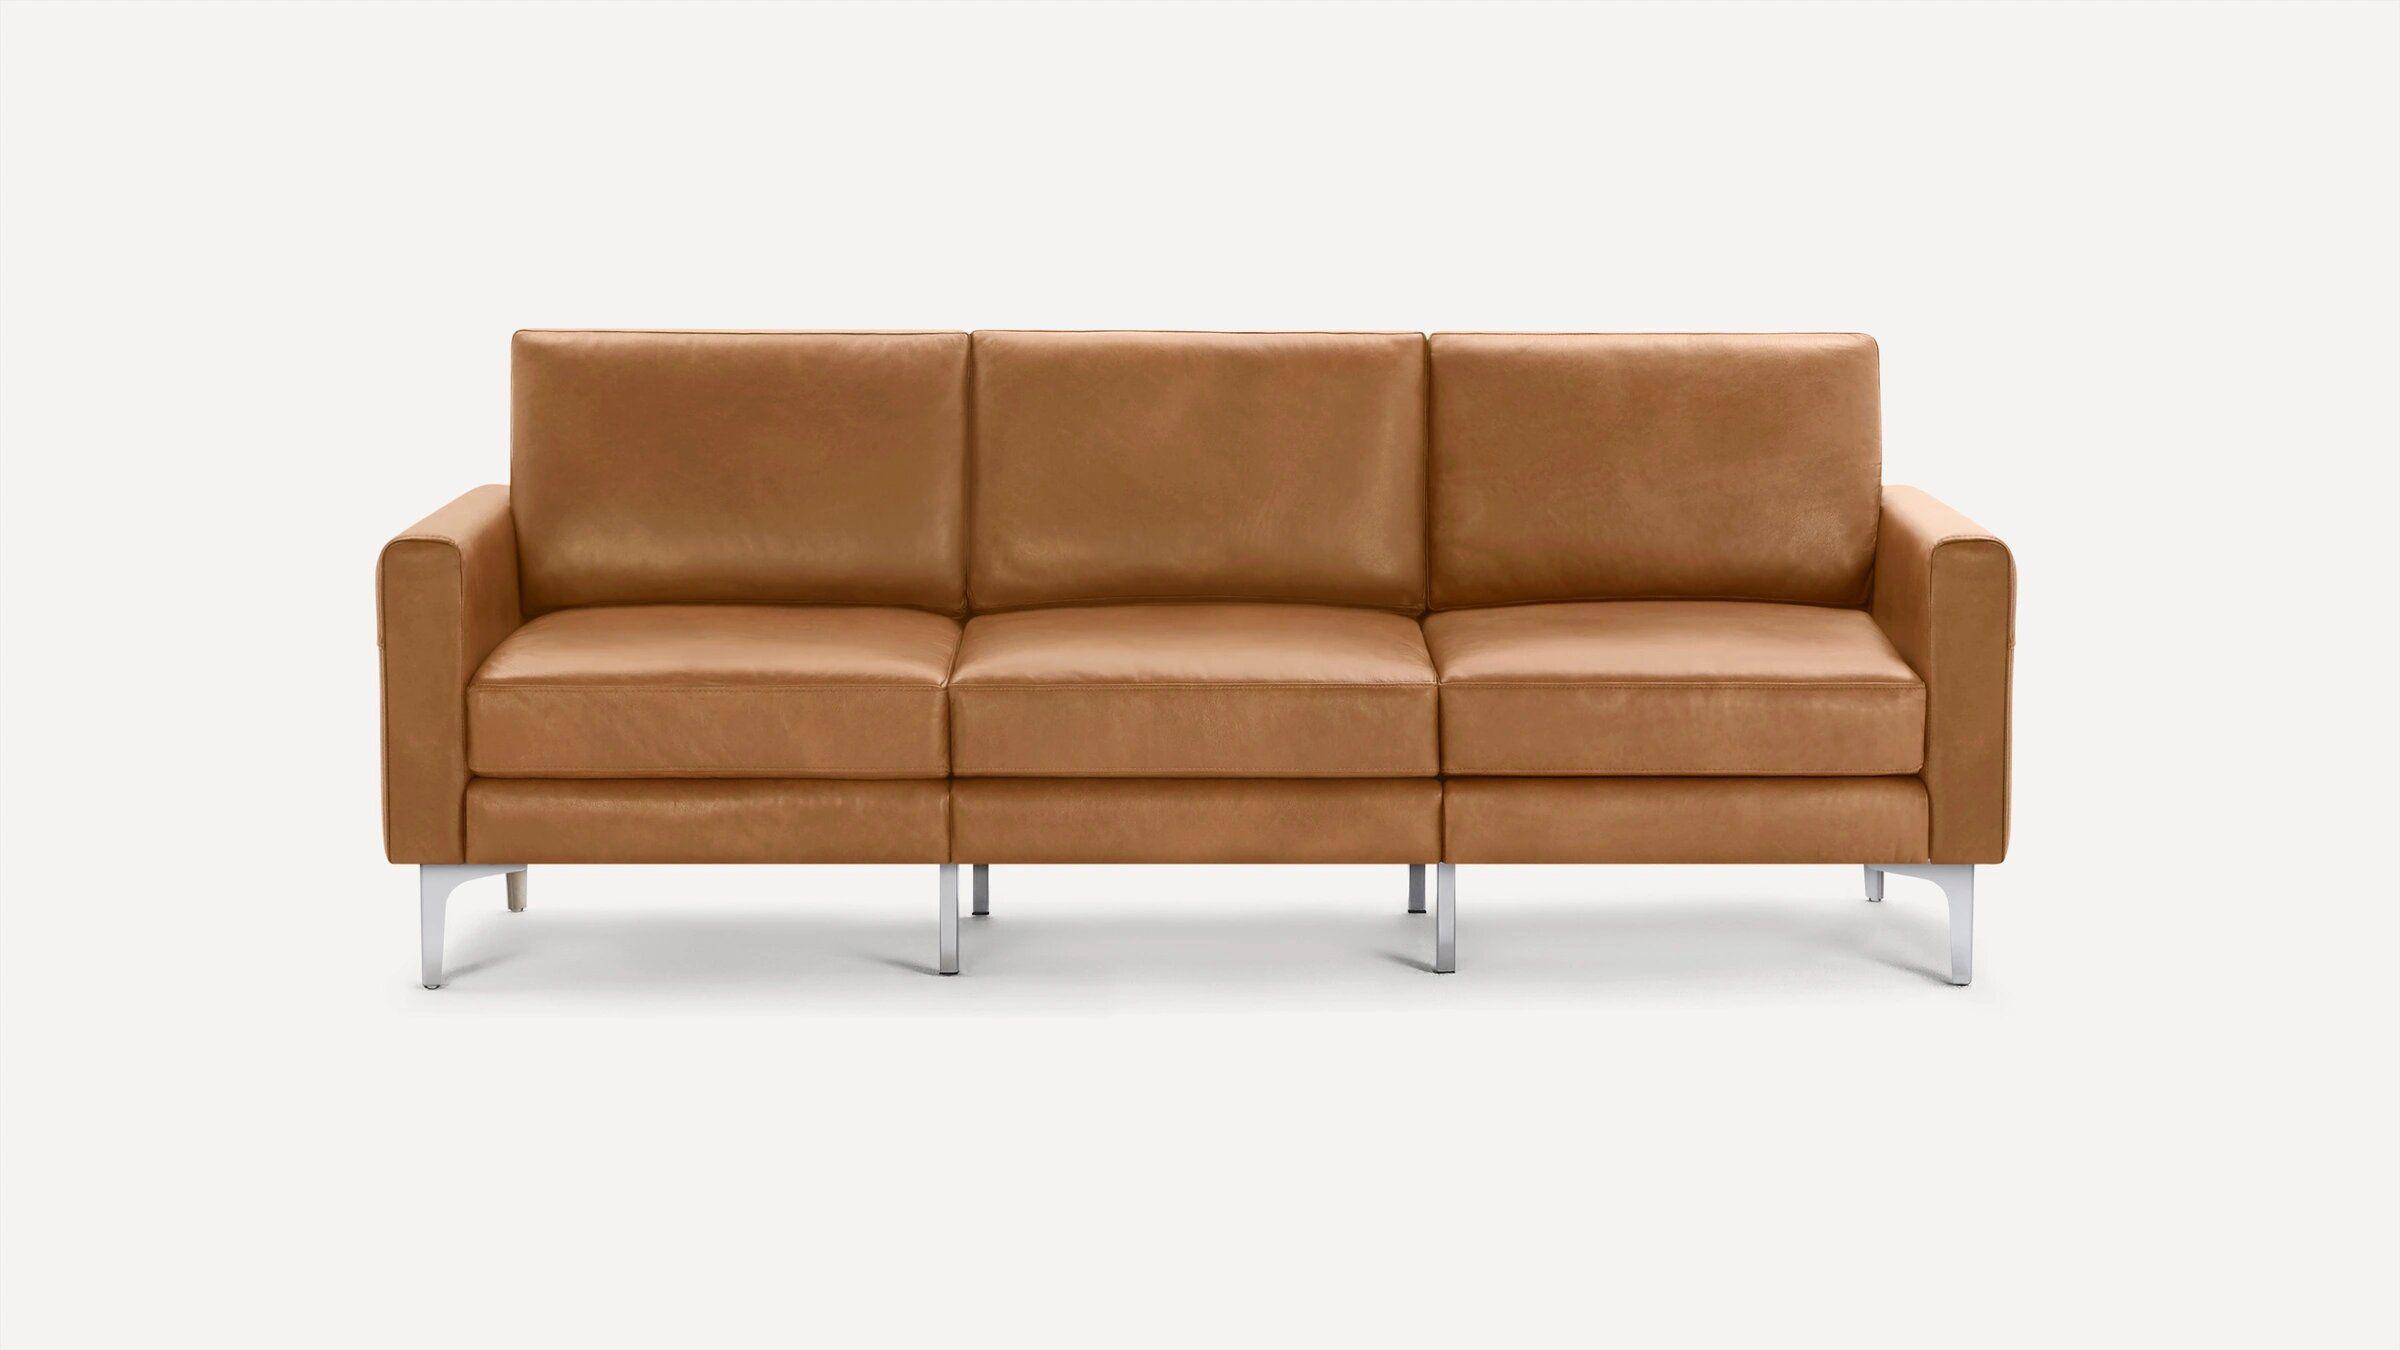 Burrow Block Nomad Leather Sofa